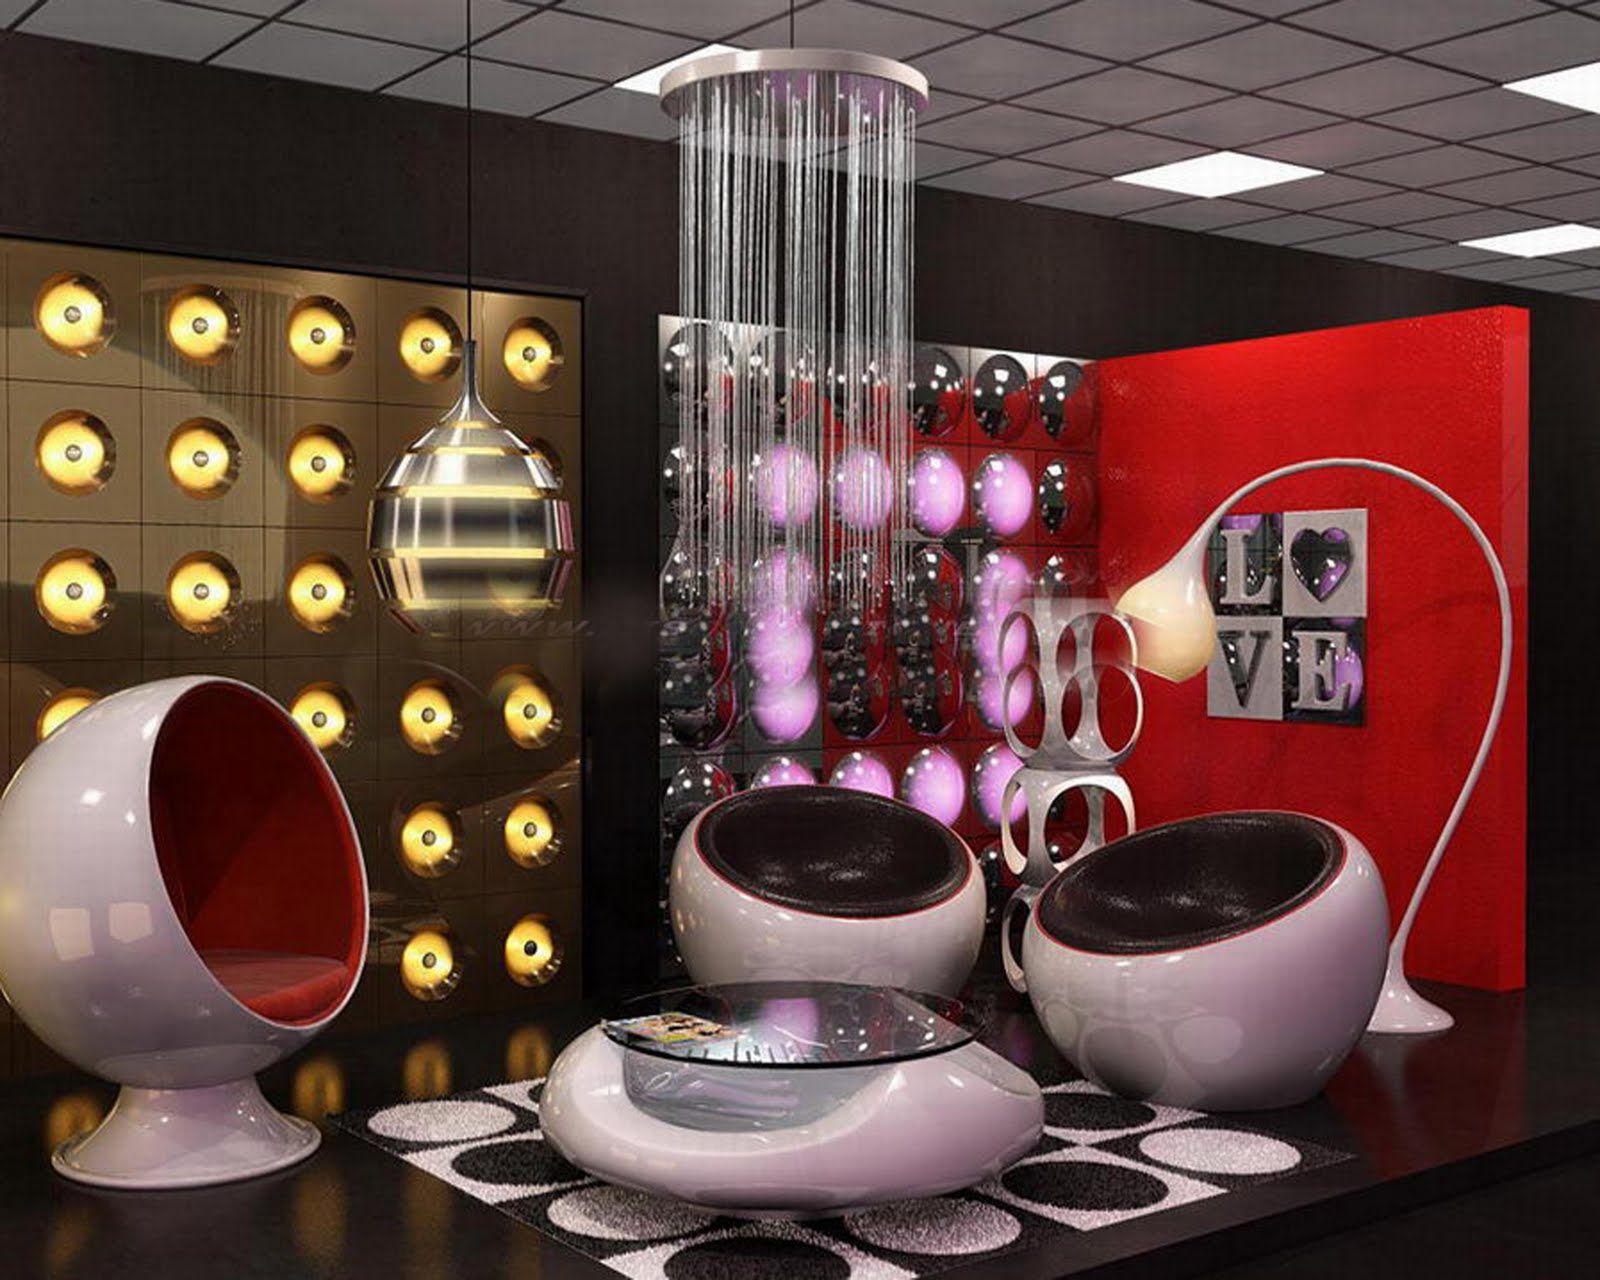 mushroom bean bag chair seat cushions for office chairs target retro futuristic interior alien pinterest